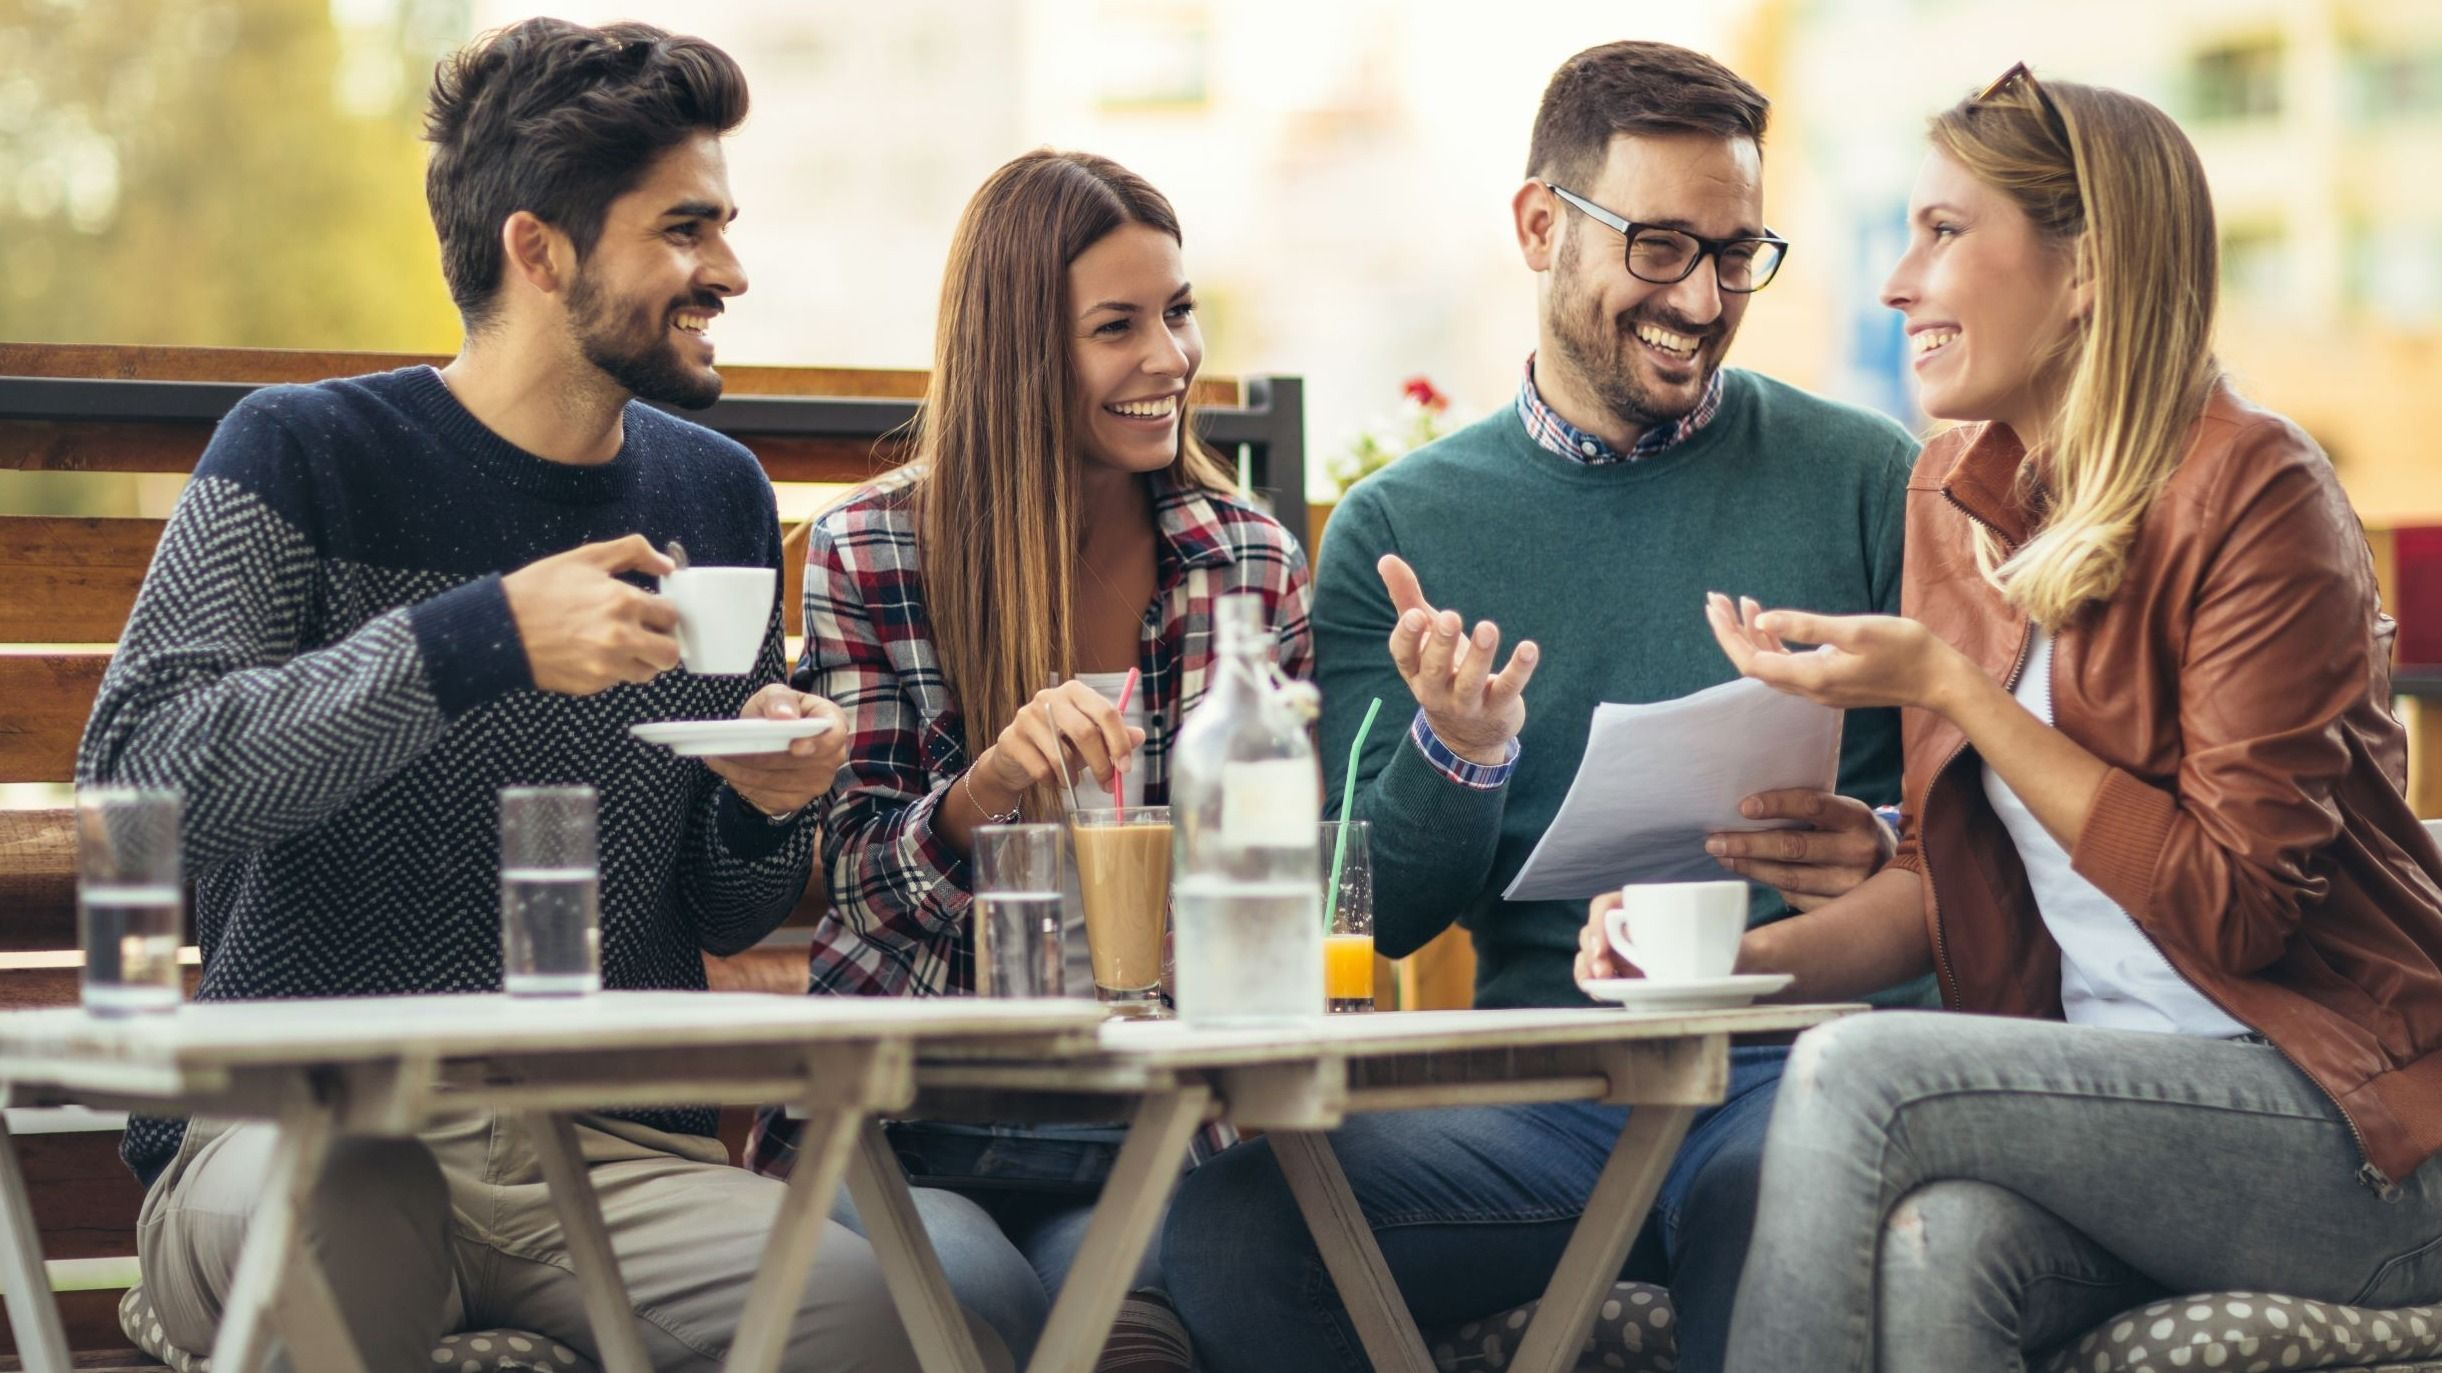 Upcoming Events | Munich Sprachcafé & After Work Hangout (München, Germany)  | Meetup